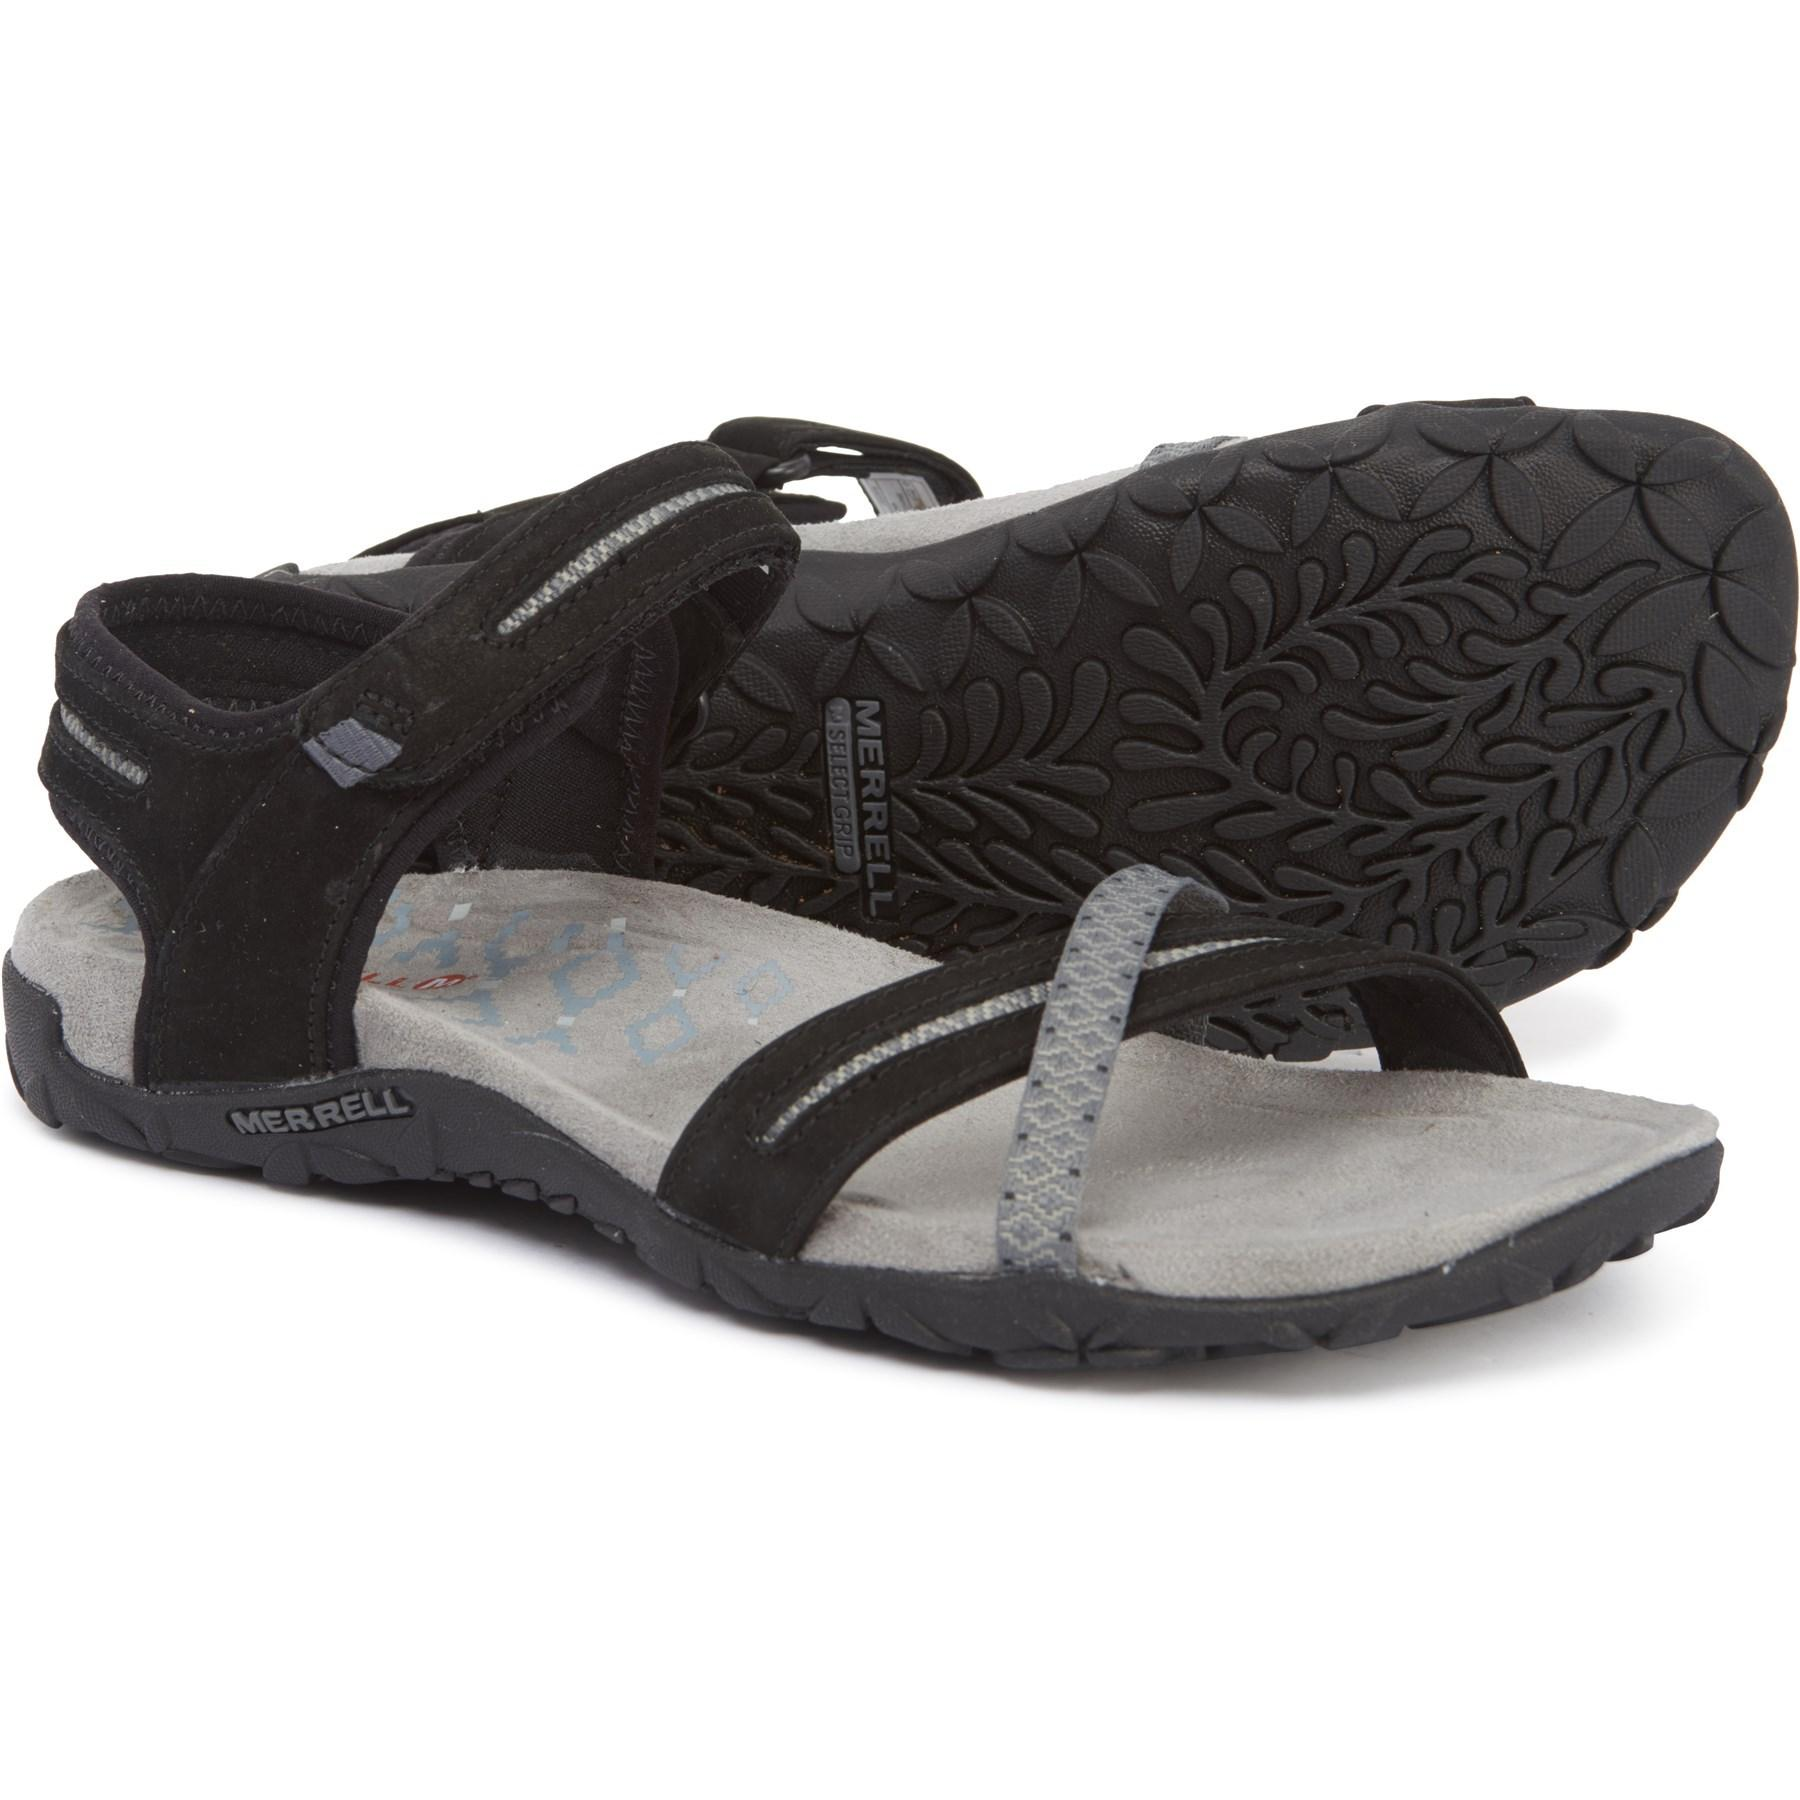 53b0781d35cdc Merrell - Black Terran Cross Ii Sport Sandals (for Women) - Lyst. View  fullscreen